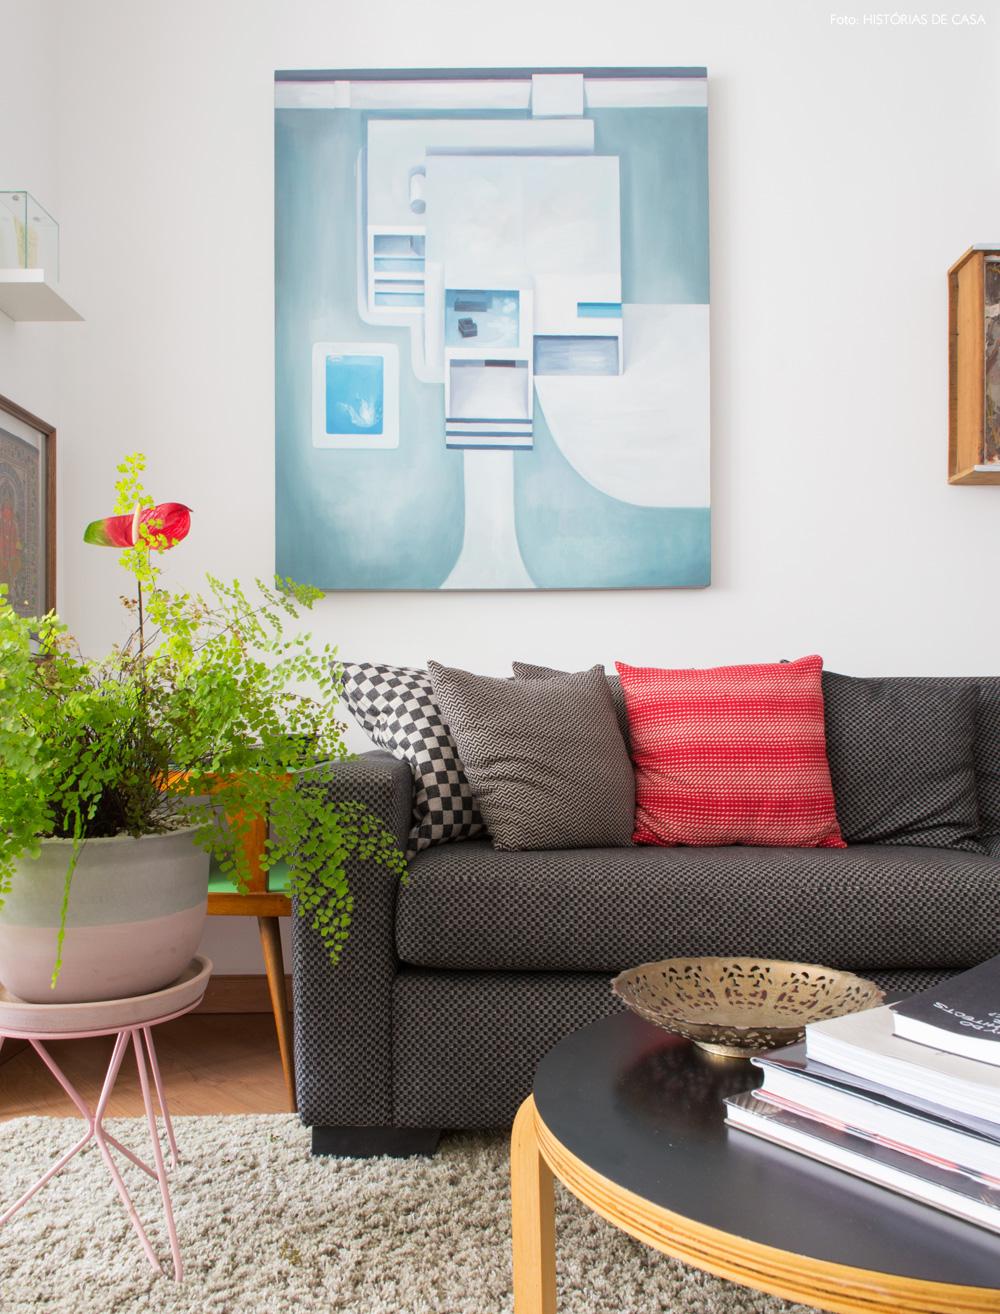 06-decoracao-apartamento-pequeno-mesa-redonda-plantas